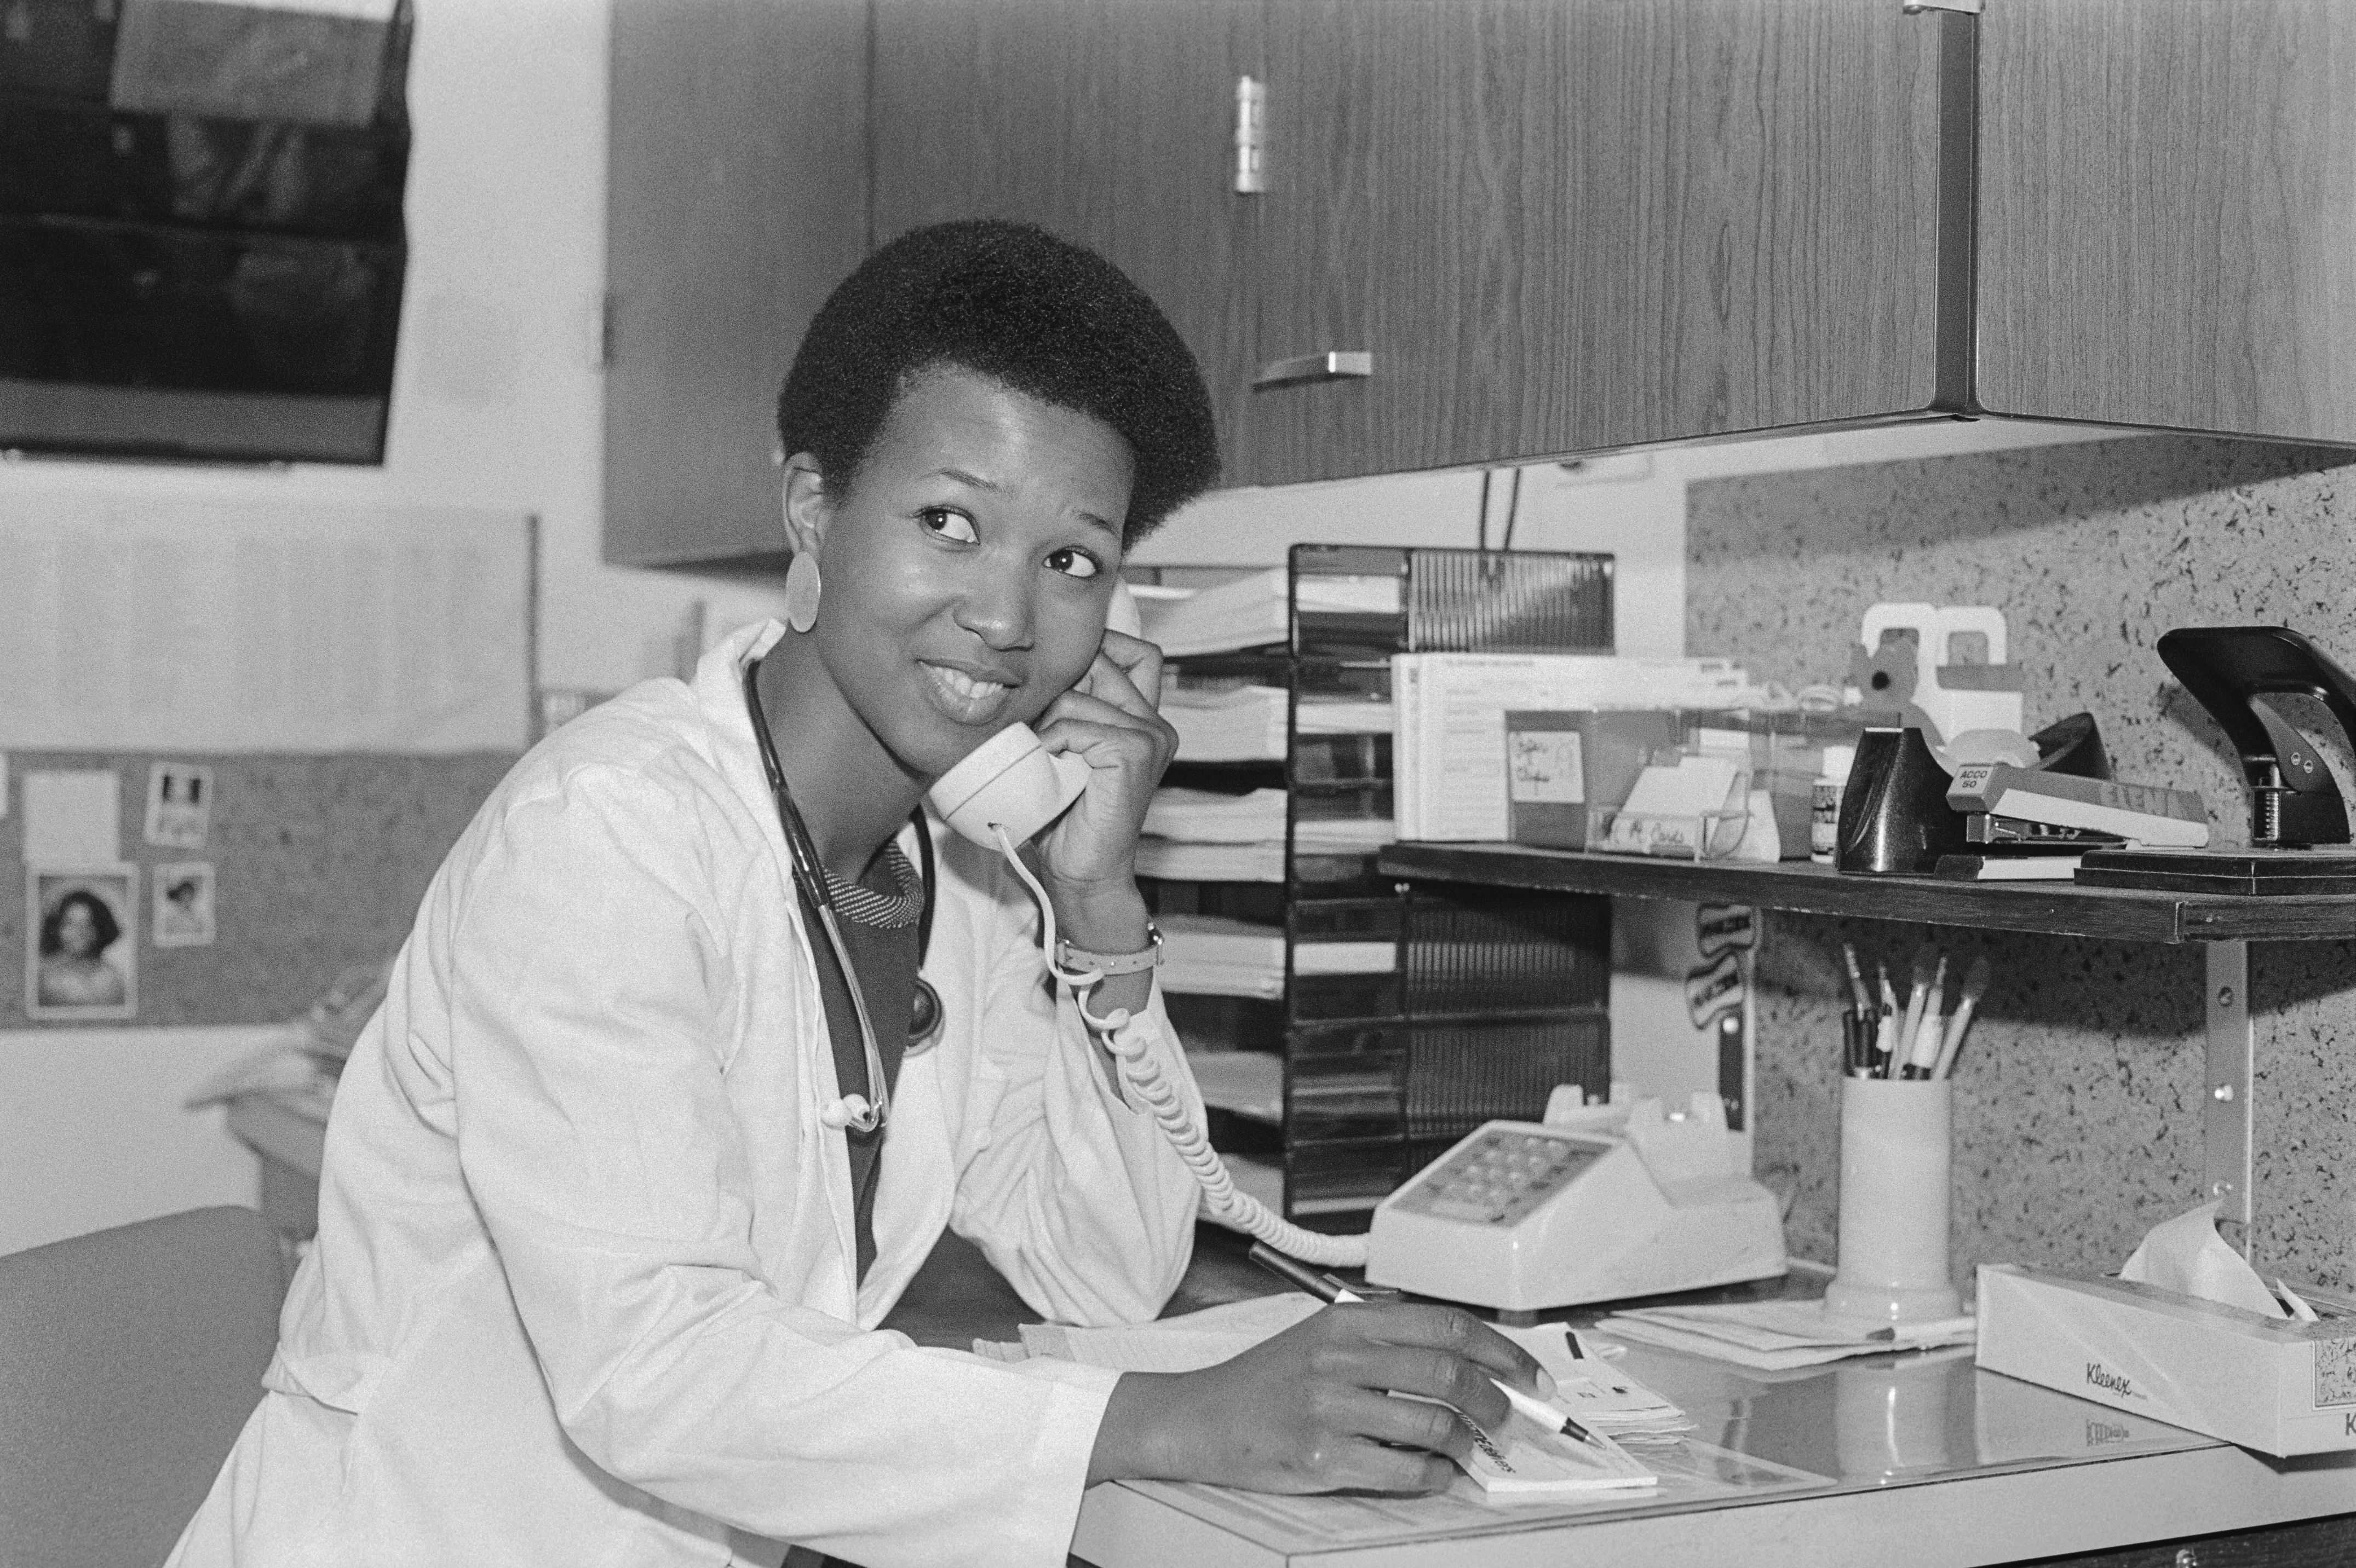 Mae Jemison, First Black Woman Astronaut - Quotations